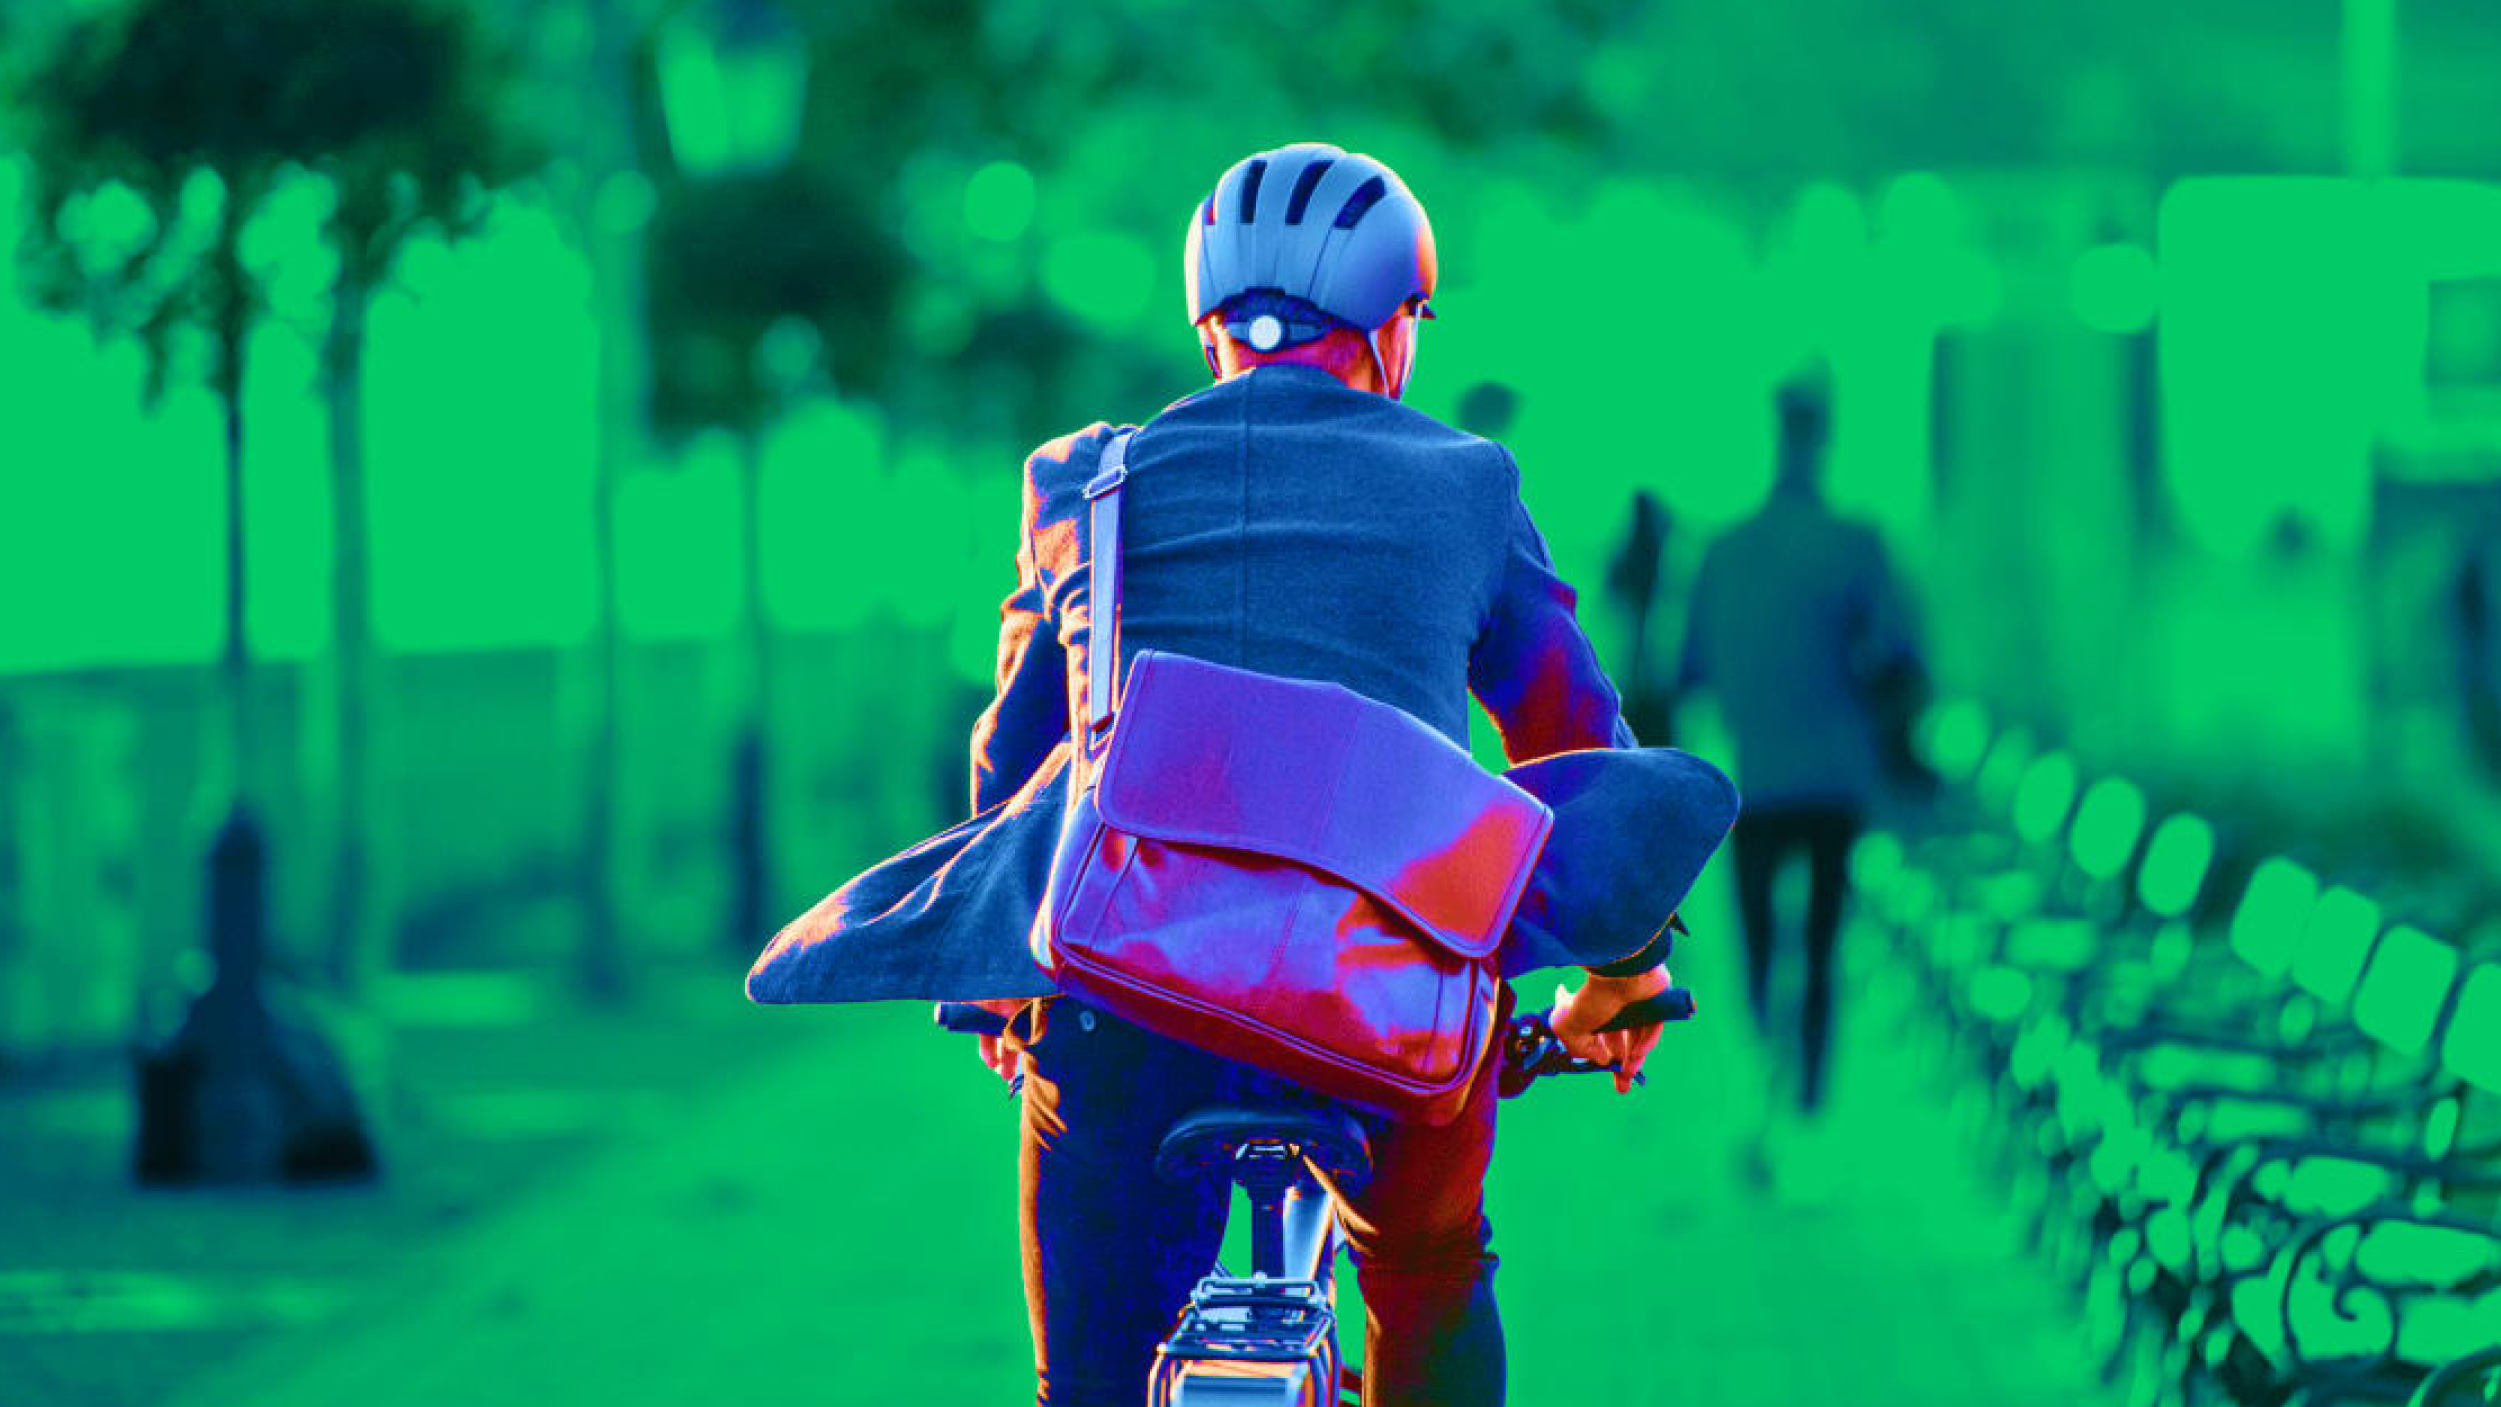 Businessman Commuting on Bike